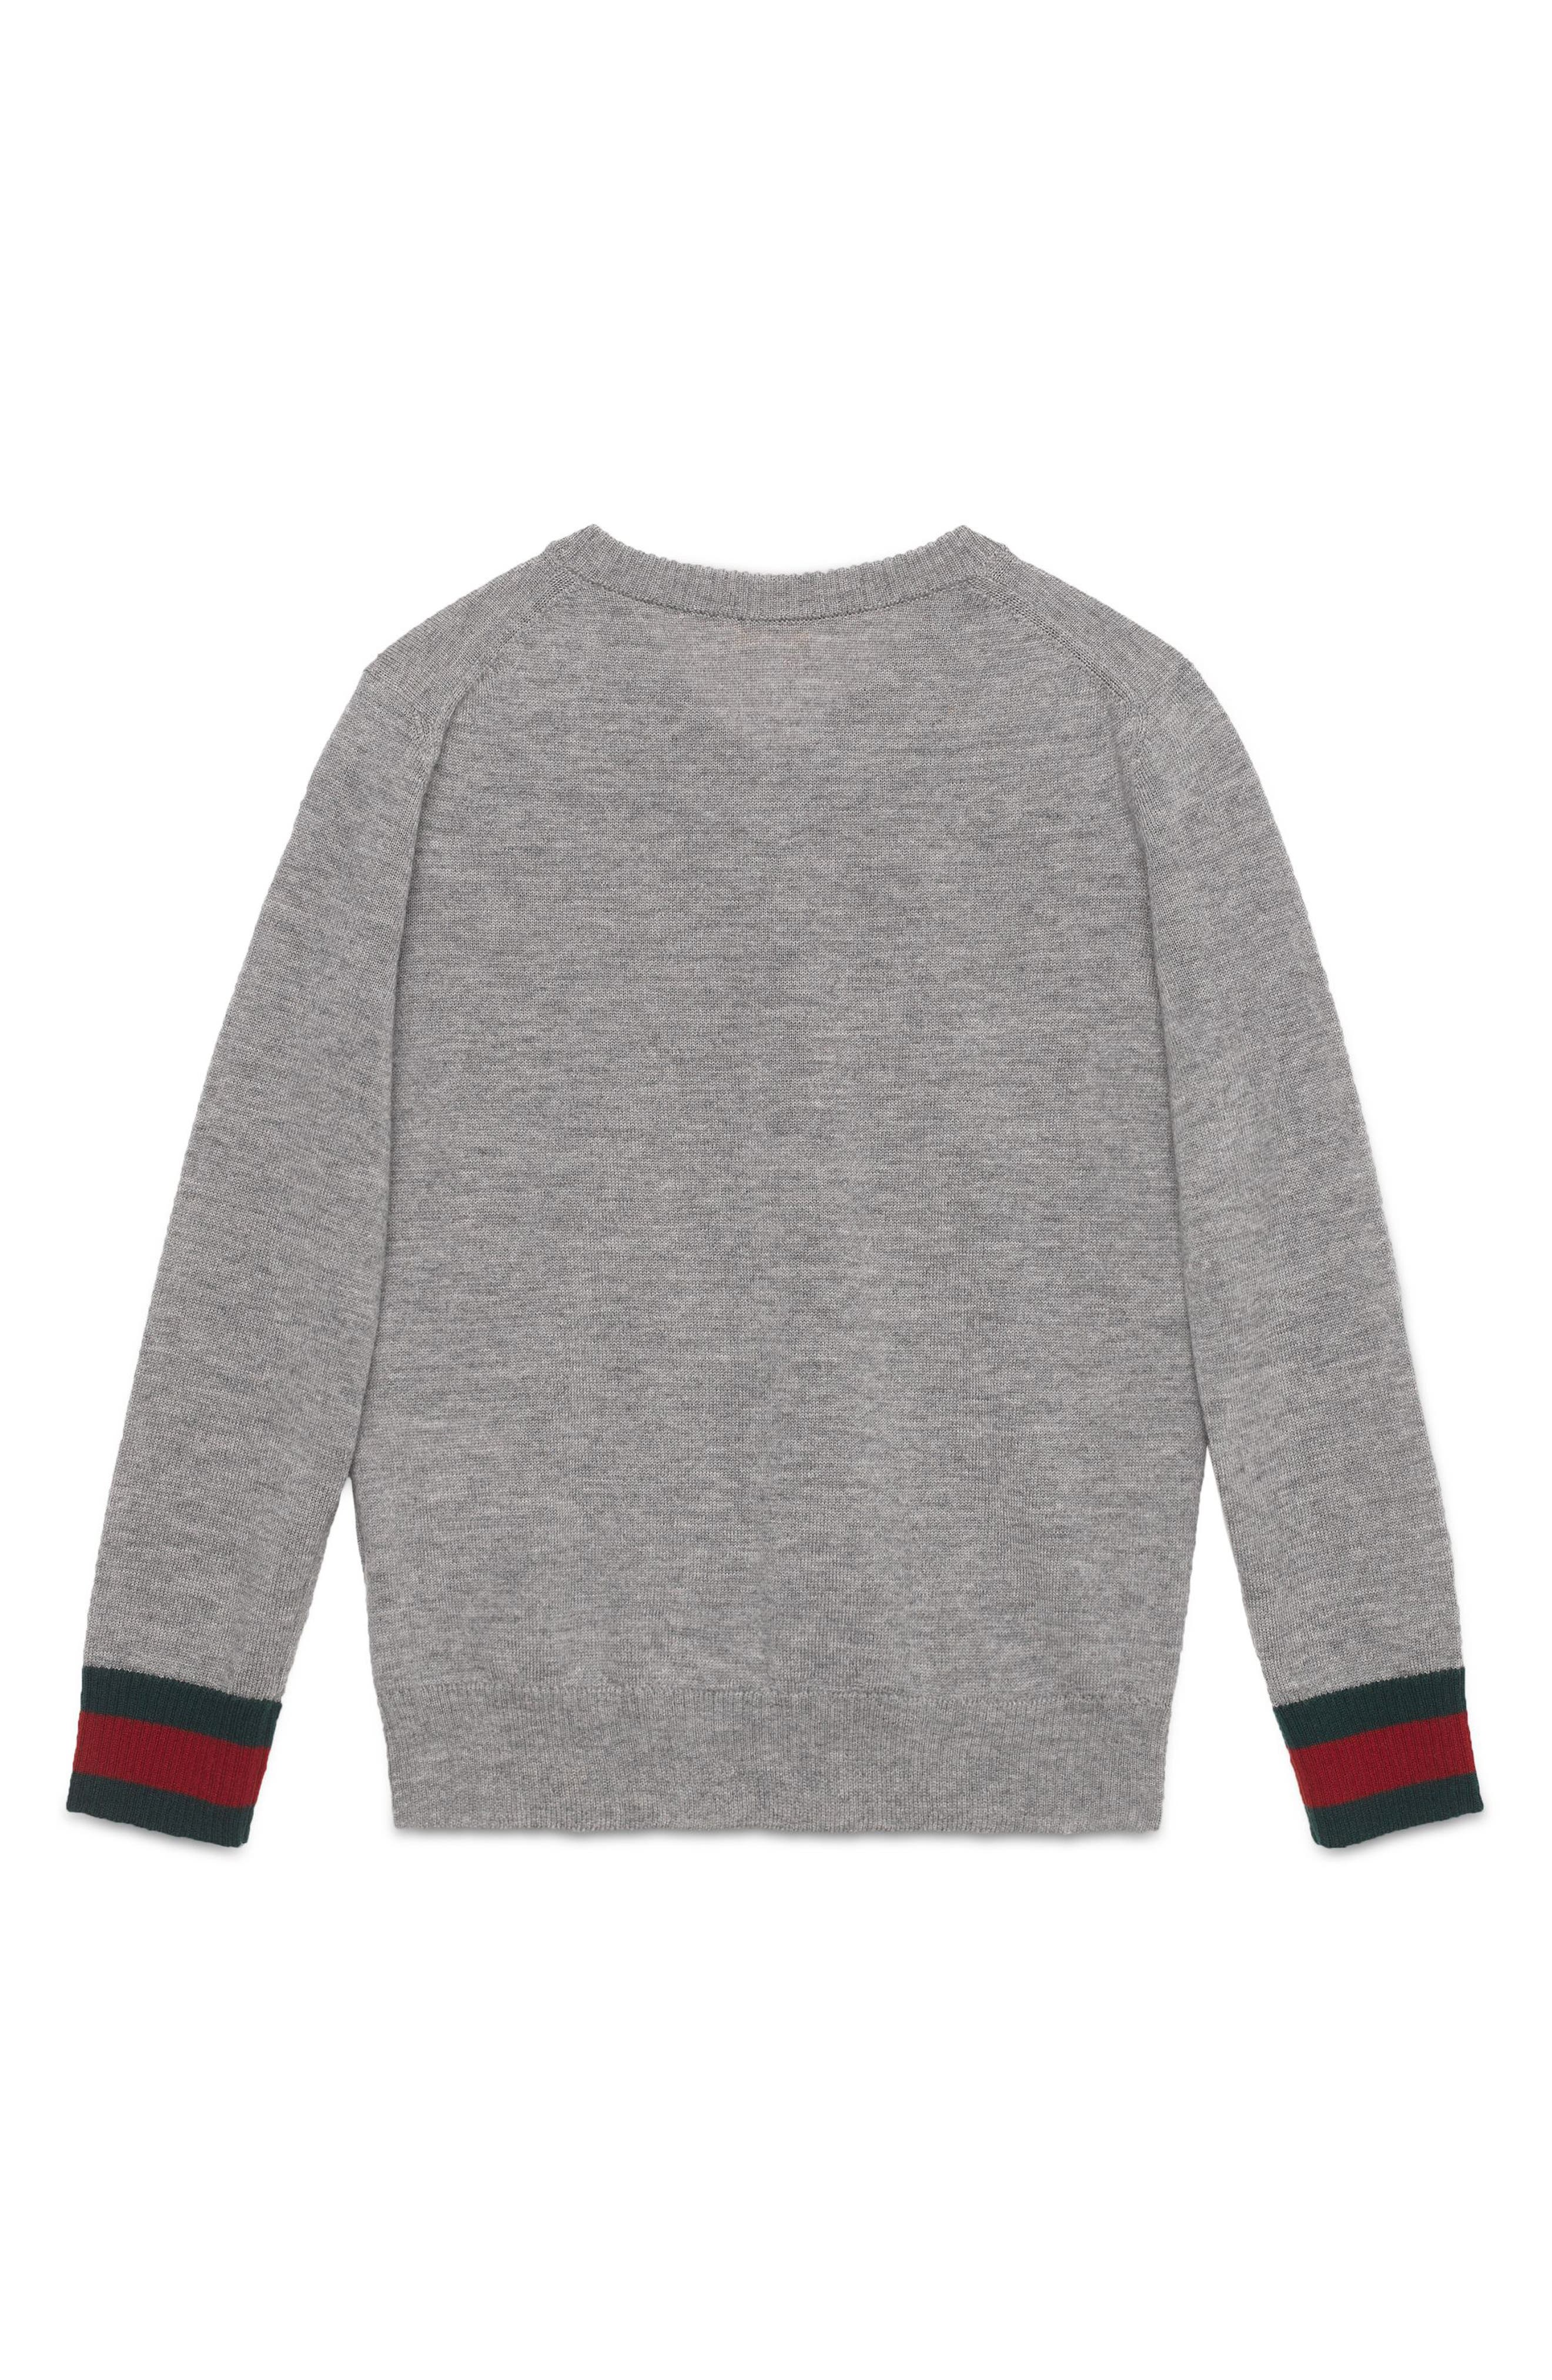 Stripe Cuff V-Neck Merino Wool Sweater,                             Alternate thumbnail 3, color,                             GREY MULTI